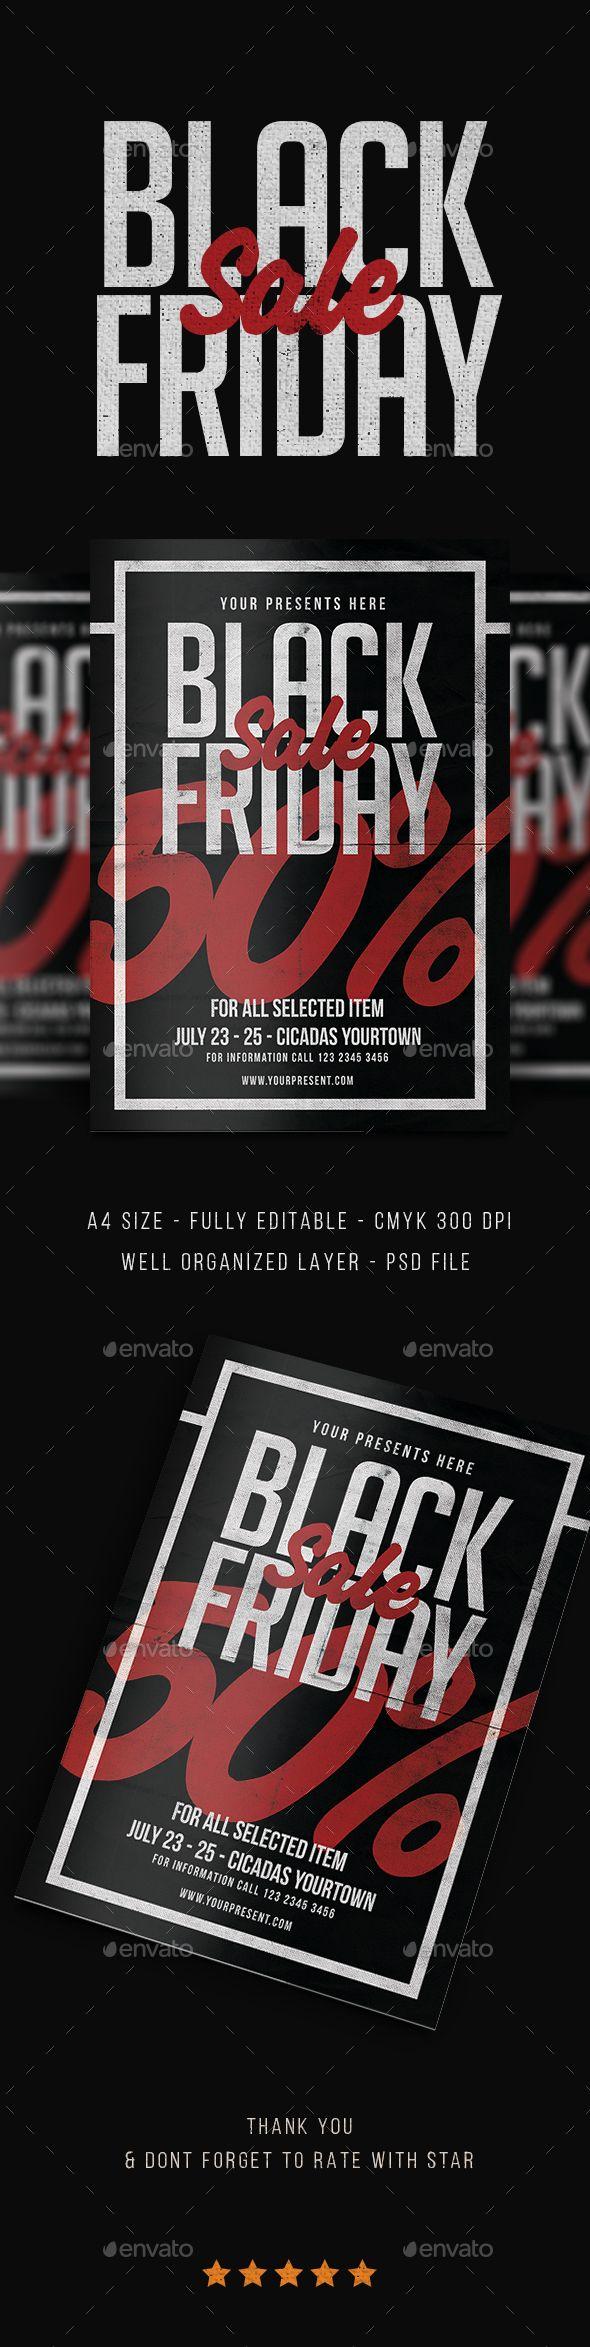 black friday sale flyer template psd bfs pinterest sale flyer